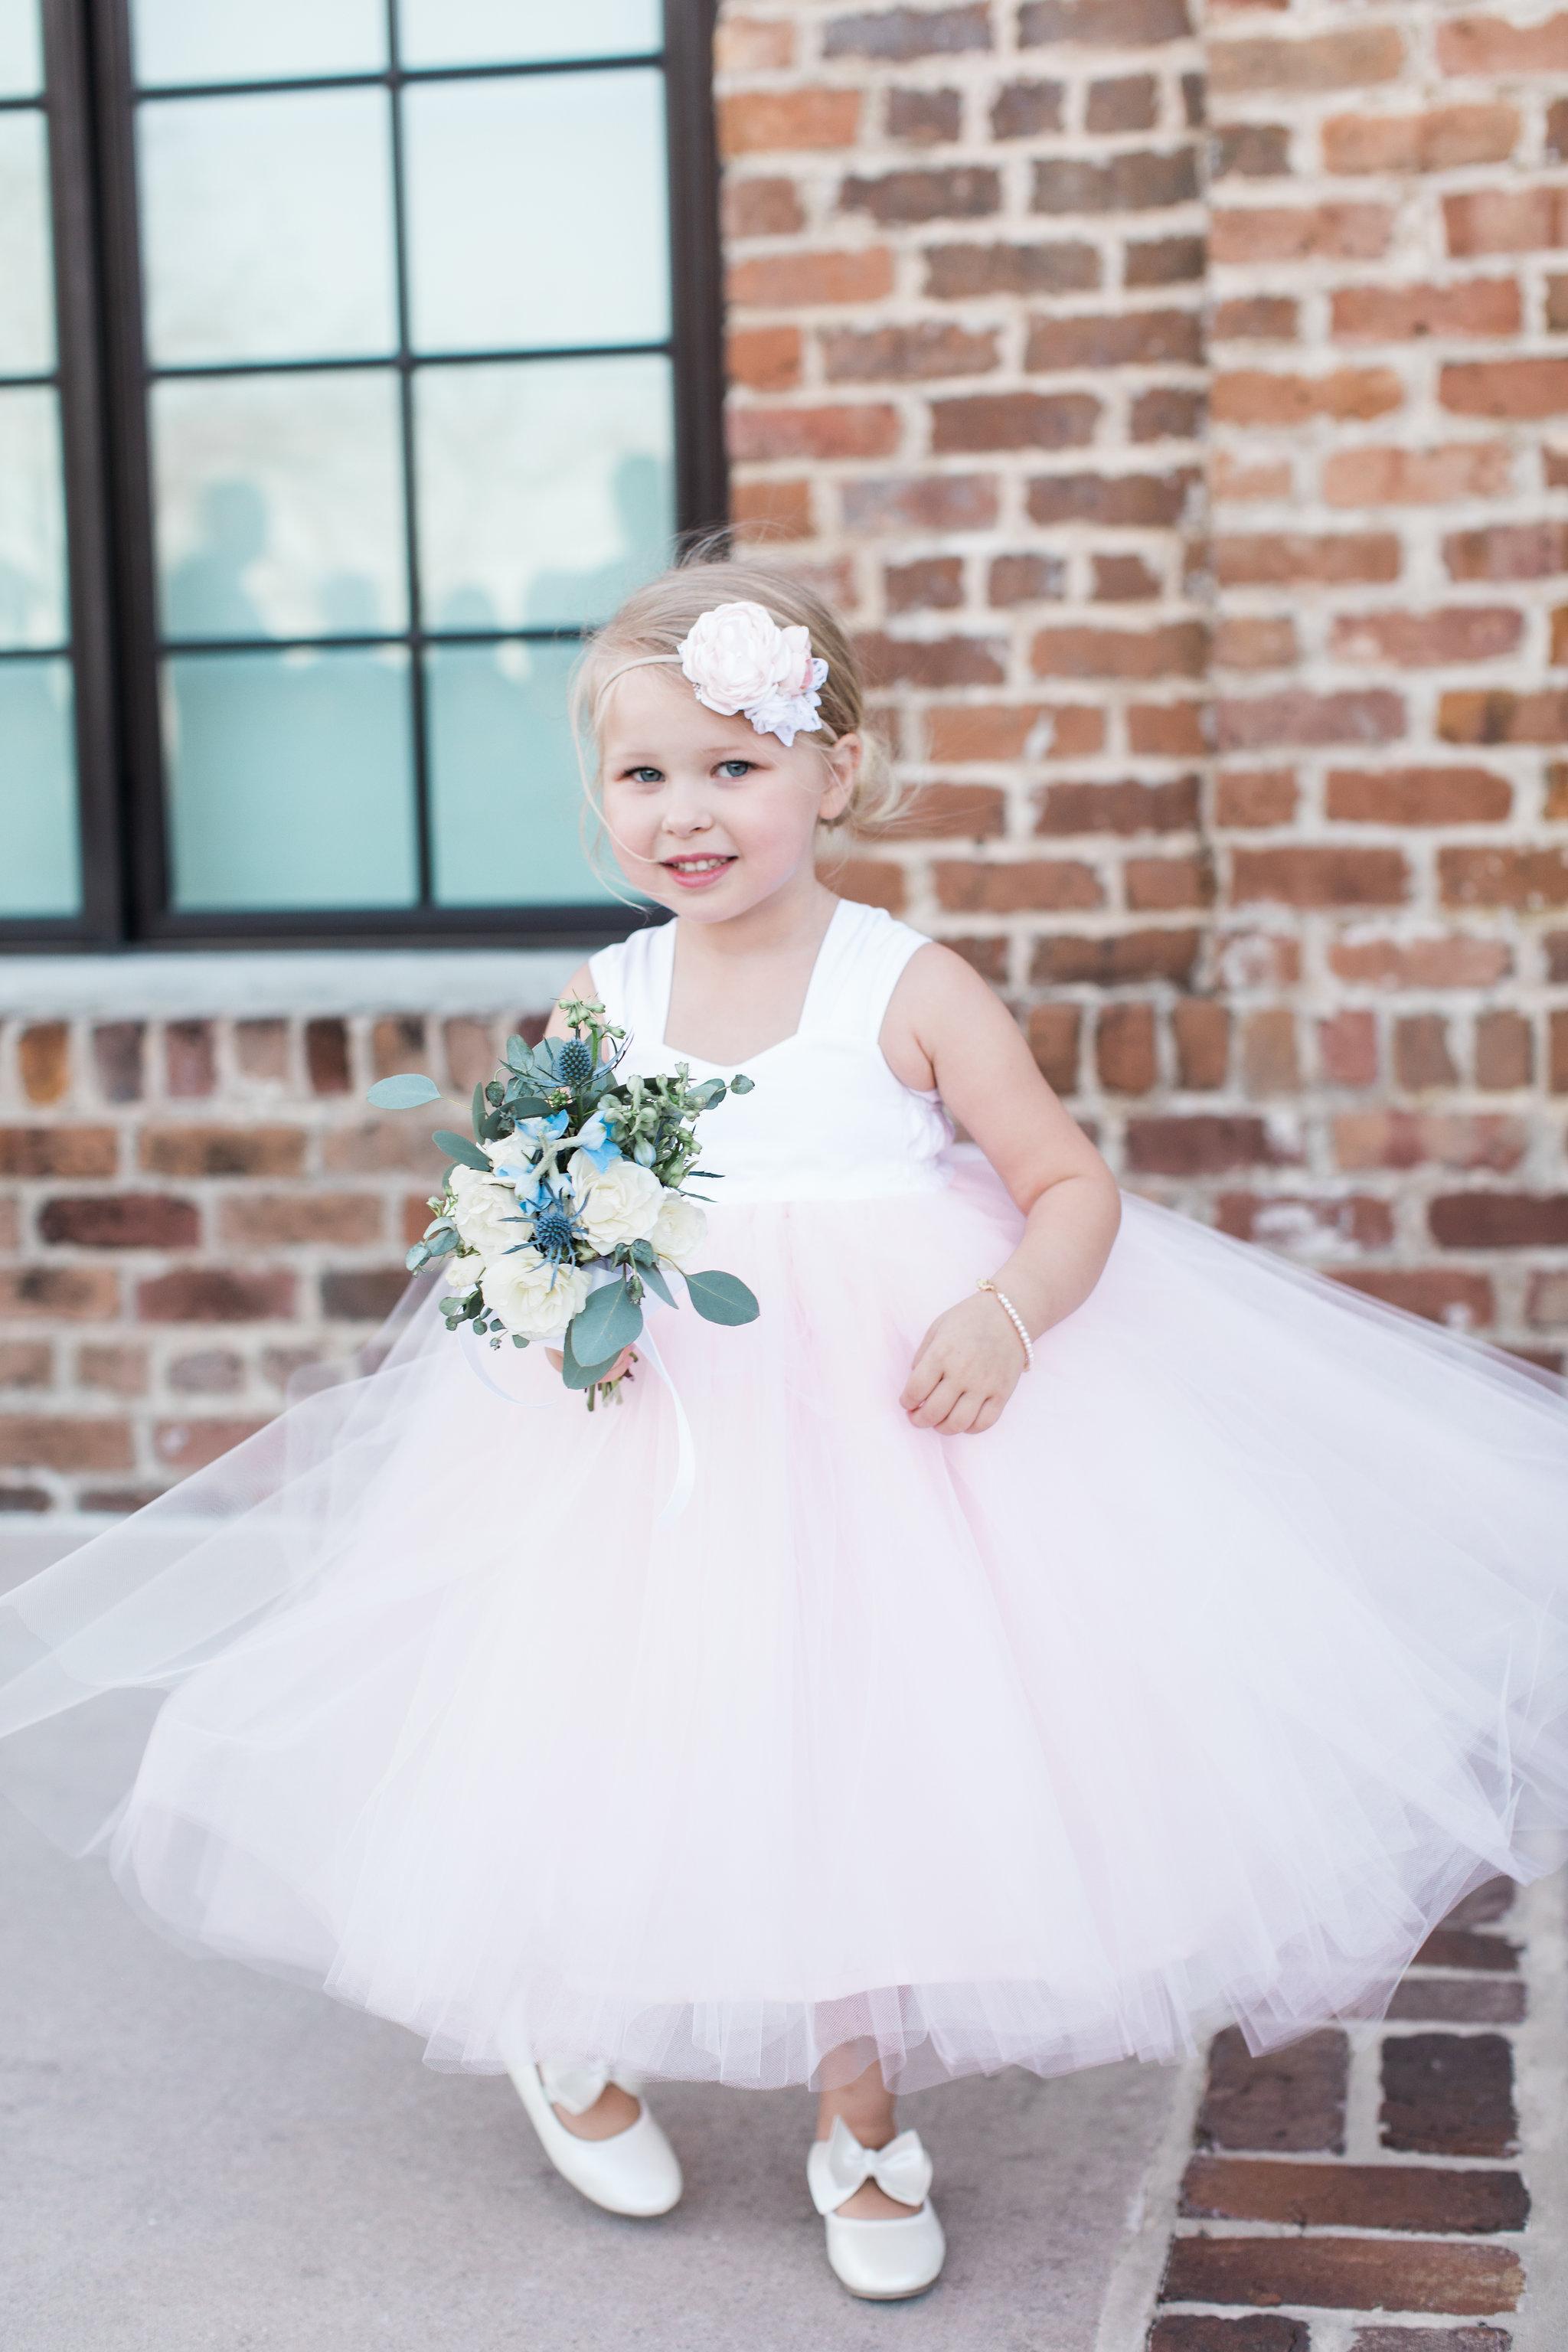 apt-b-photography-Savannah-wedding-photographer-savannah-engagement-photographer-historic-savannah-engagement-charles-h-morris-center-wedding-savannah-weddings-32.JPG